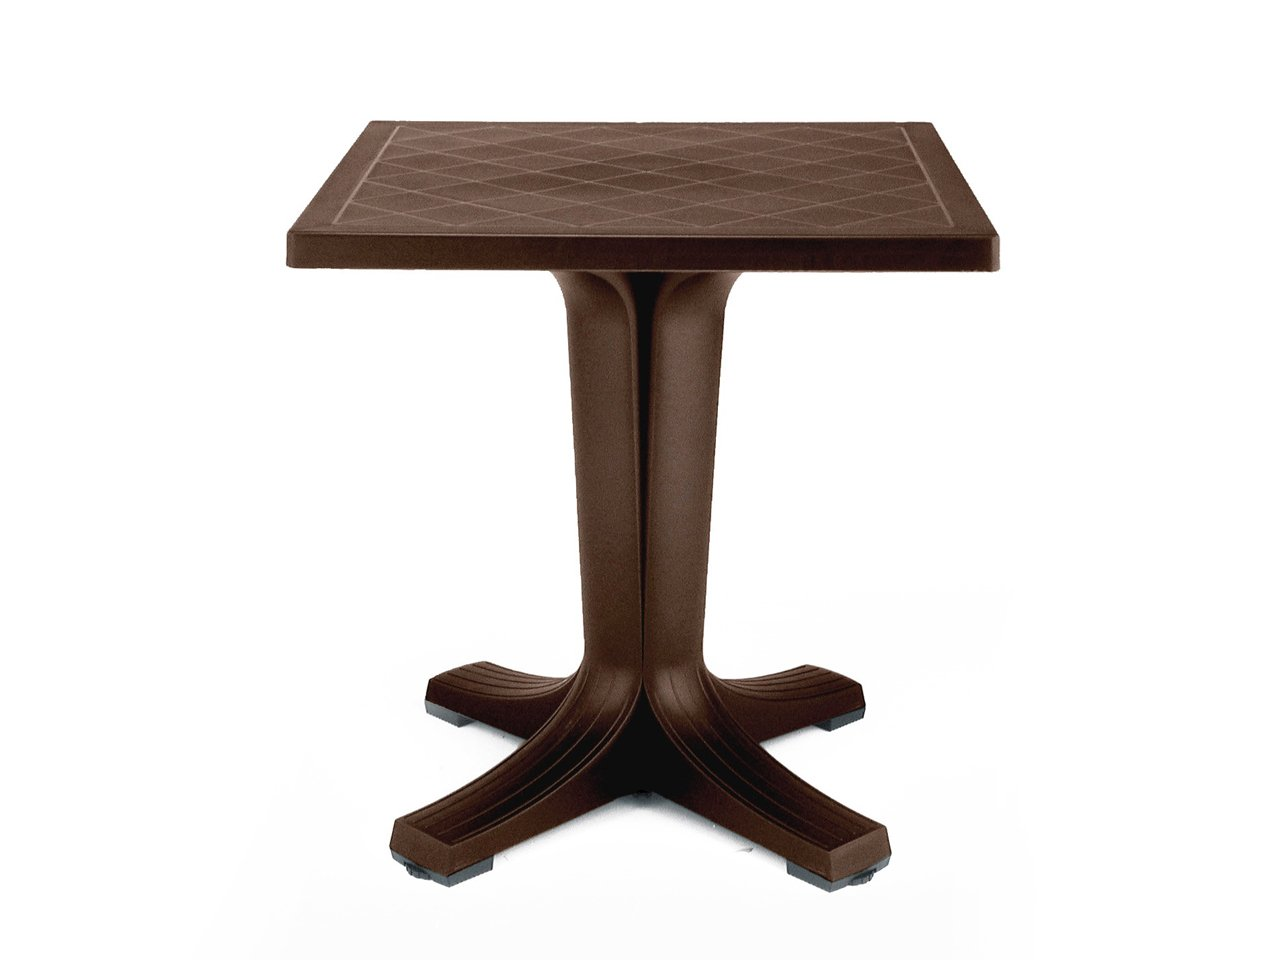 Стол пластиковый квадратный 70, giove, nardi, 700х700х730 мм.